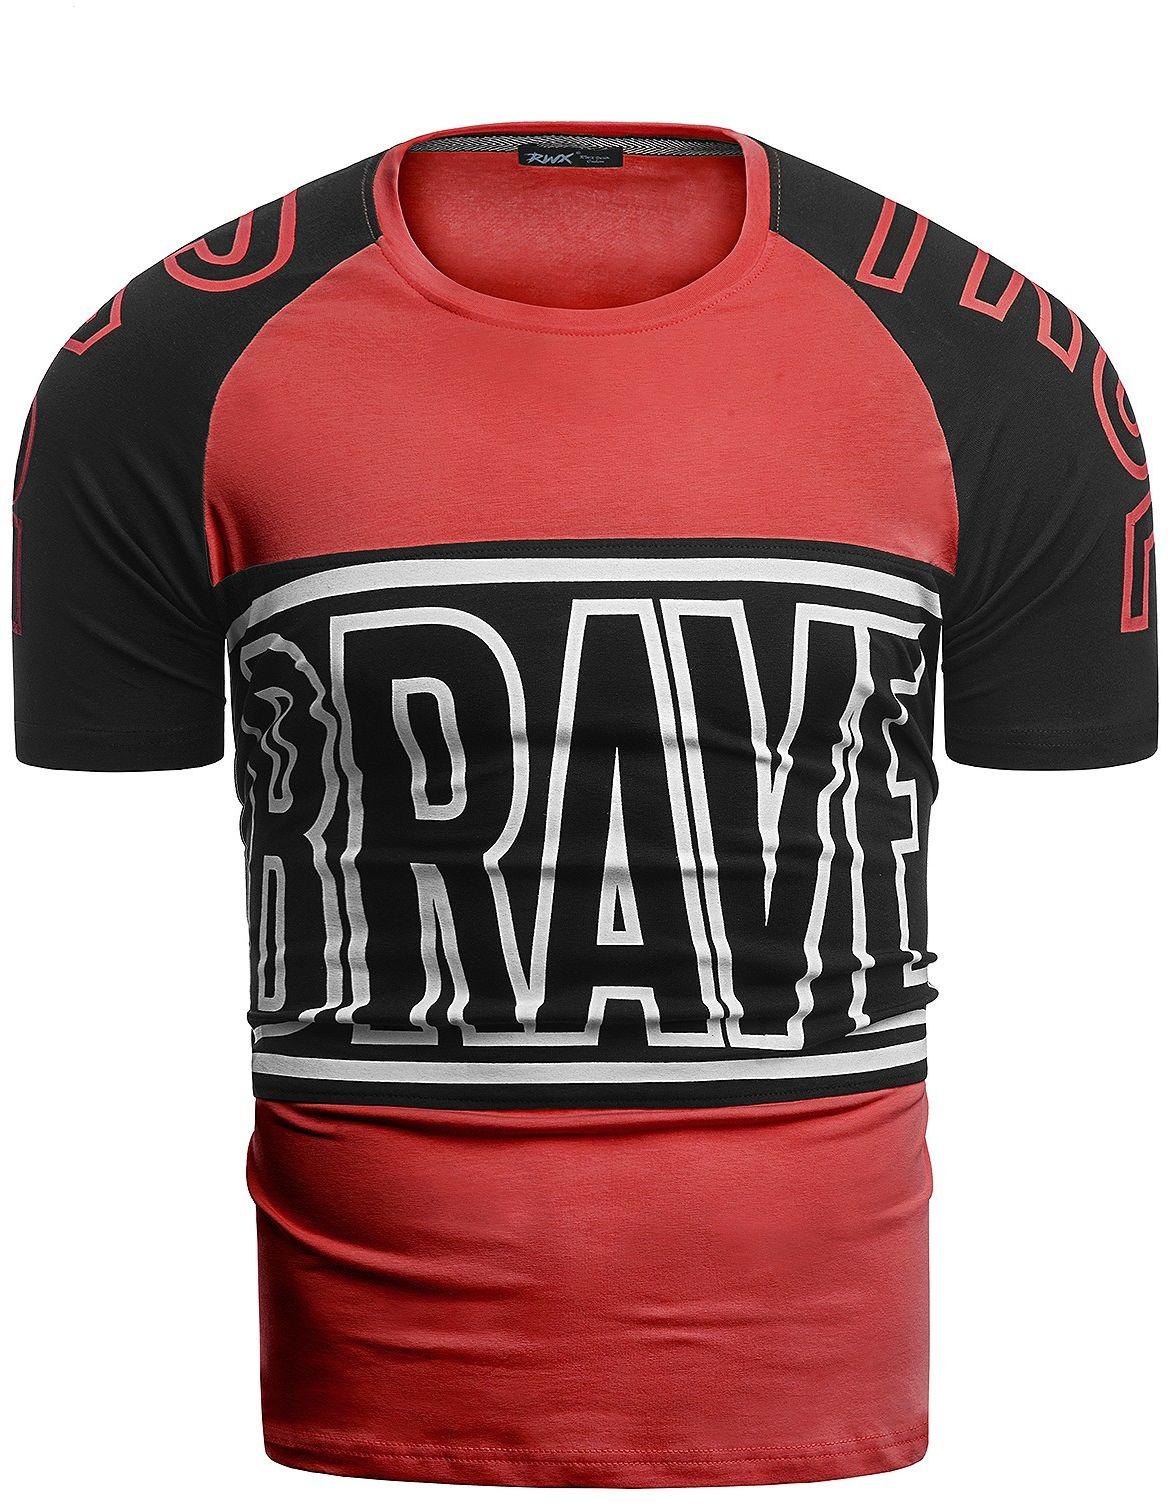 Męska koszulka t-shirt 2070 - czerwona